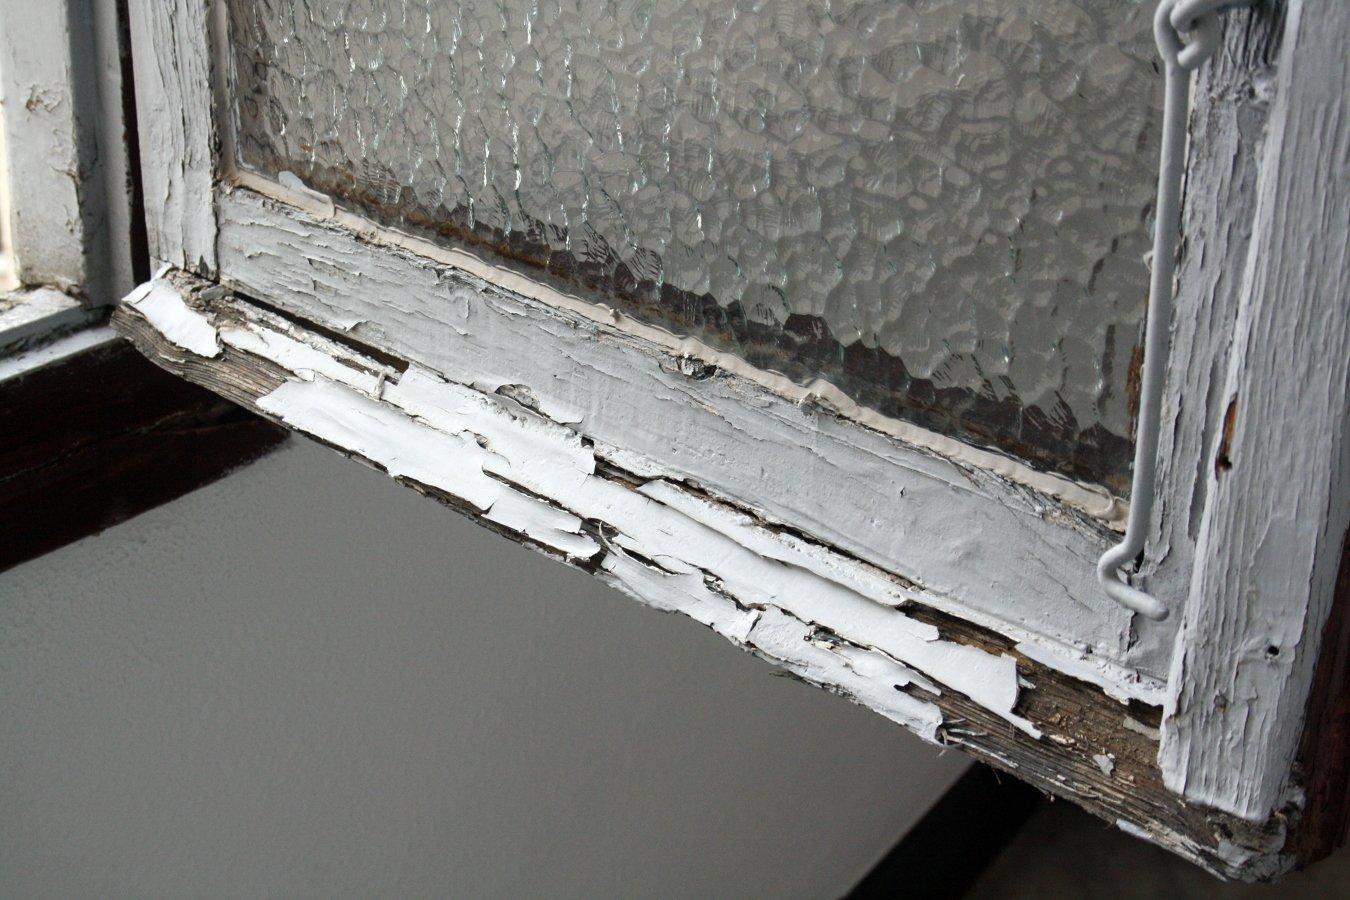 Reparar ventanas de madera zaragoza zaragoza habitissimo - Pasta para reparar madera ...